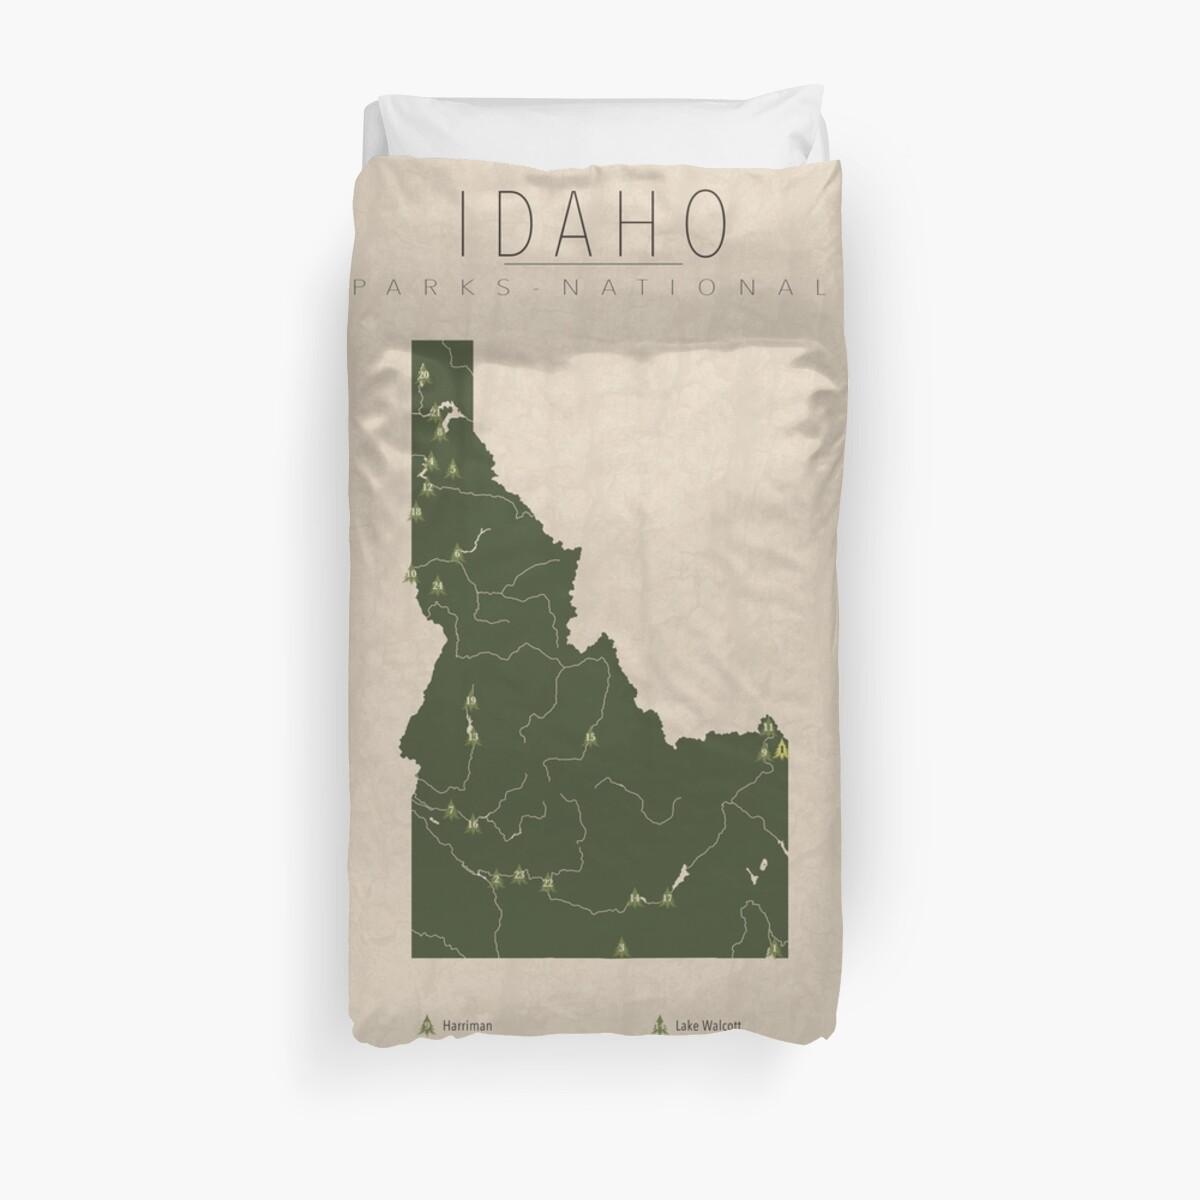 Idaho Parks by FinlayMcNevin